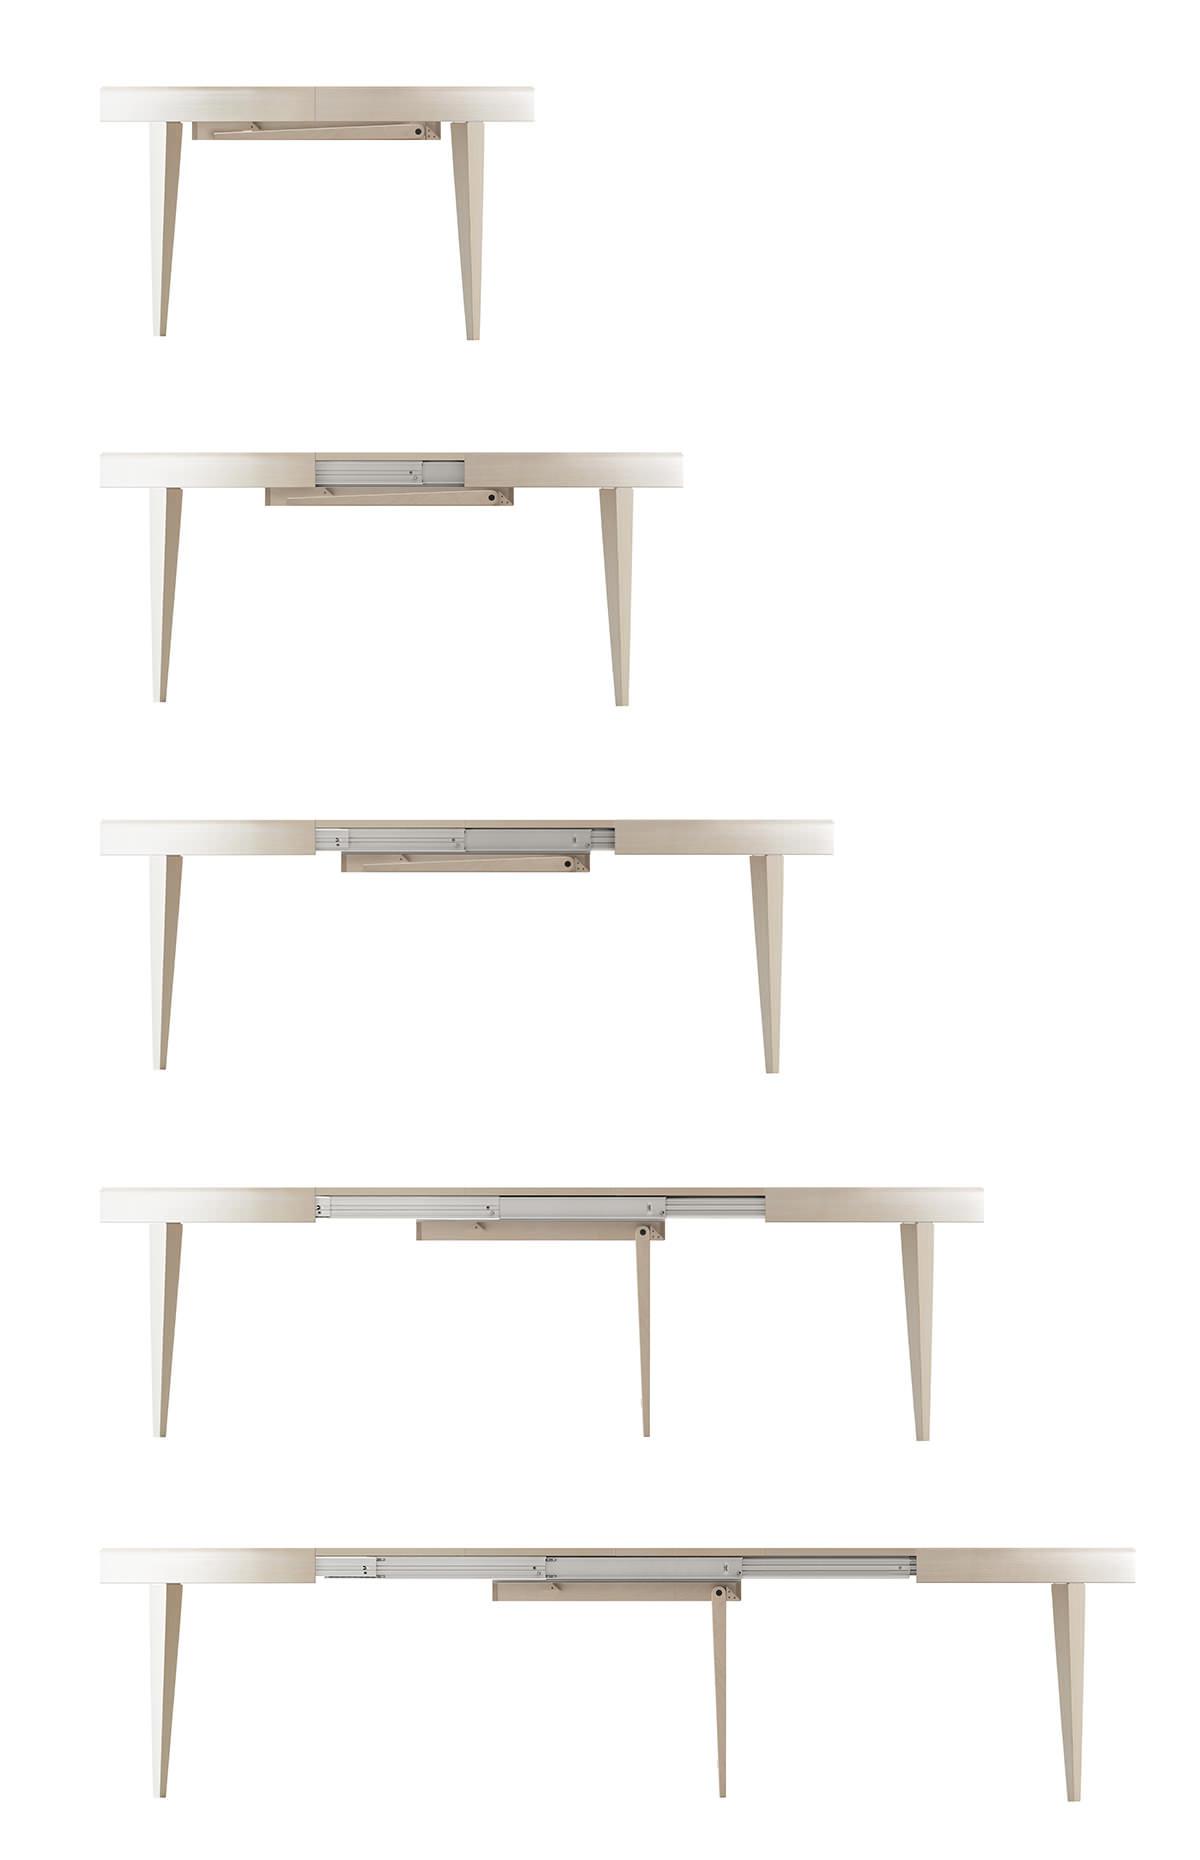 Tavolo allungabile rotondo finest tavolo rotondo allungabile spazio alla convivialit tavoli - Tavolo tondo allungabile ikea ...